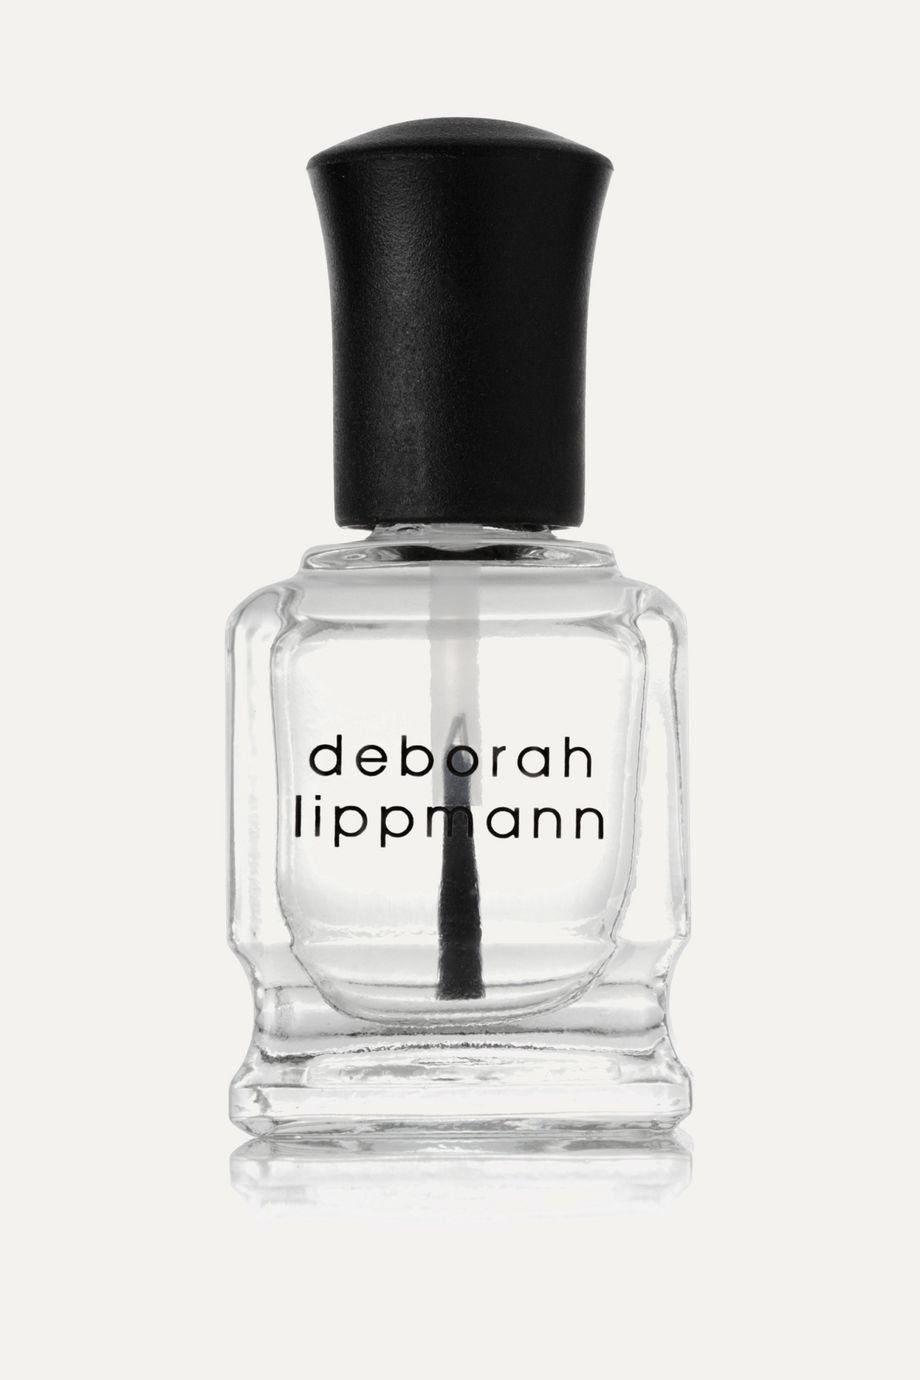 Deborah Lippmann Hard Rock Top and Base Coat